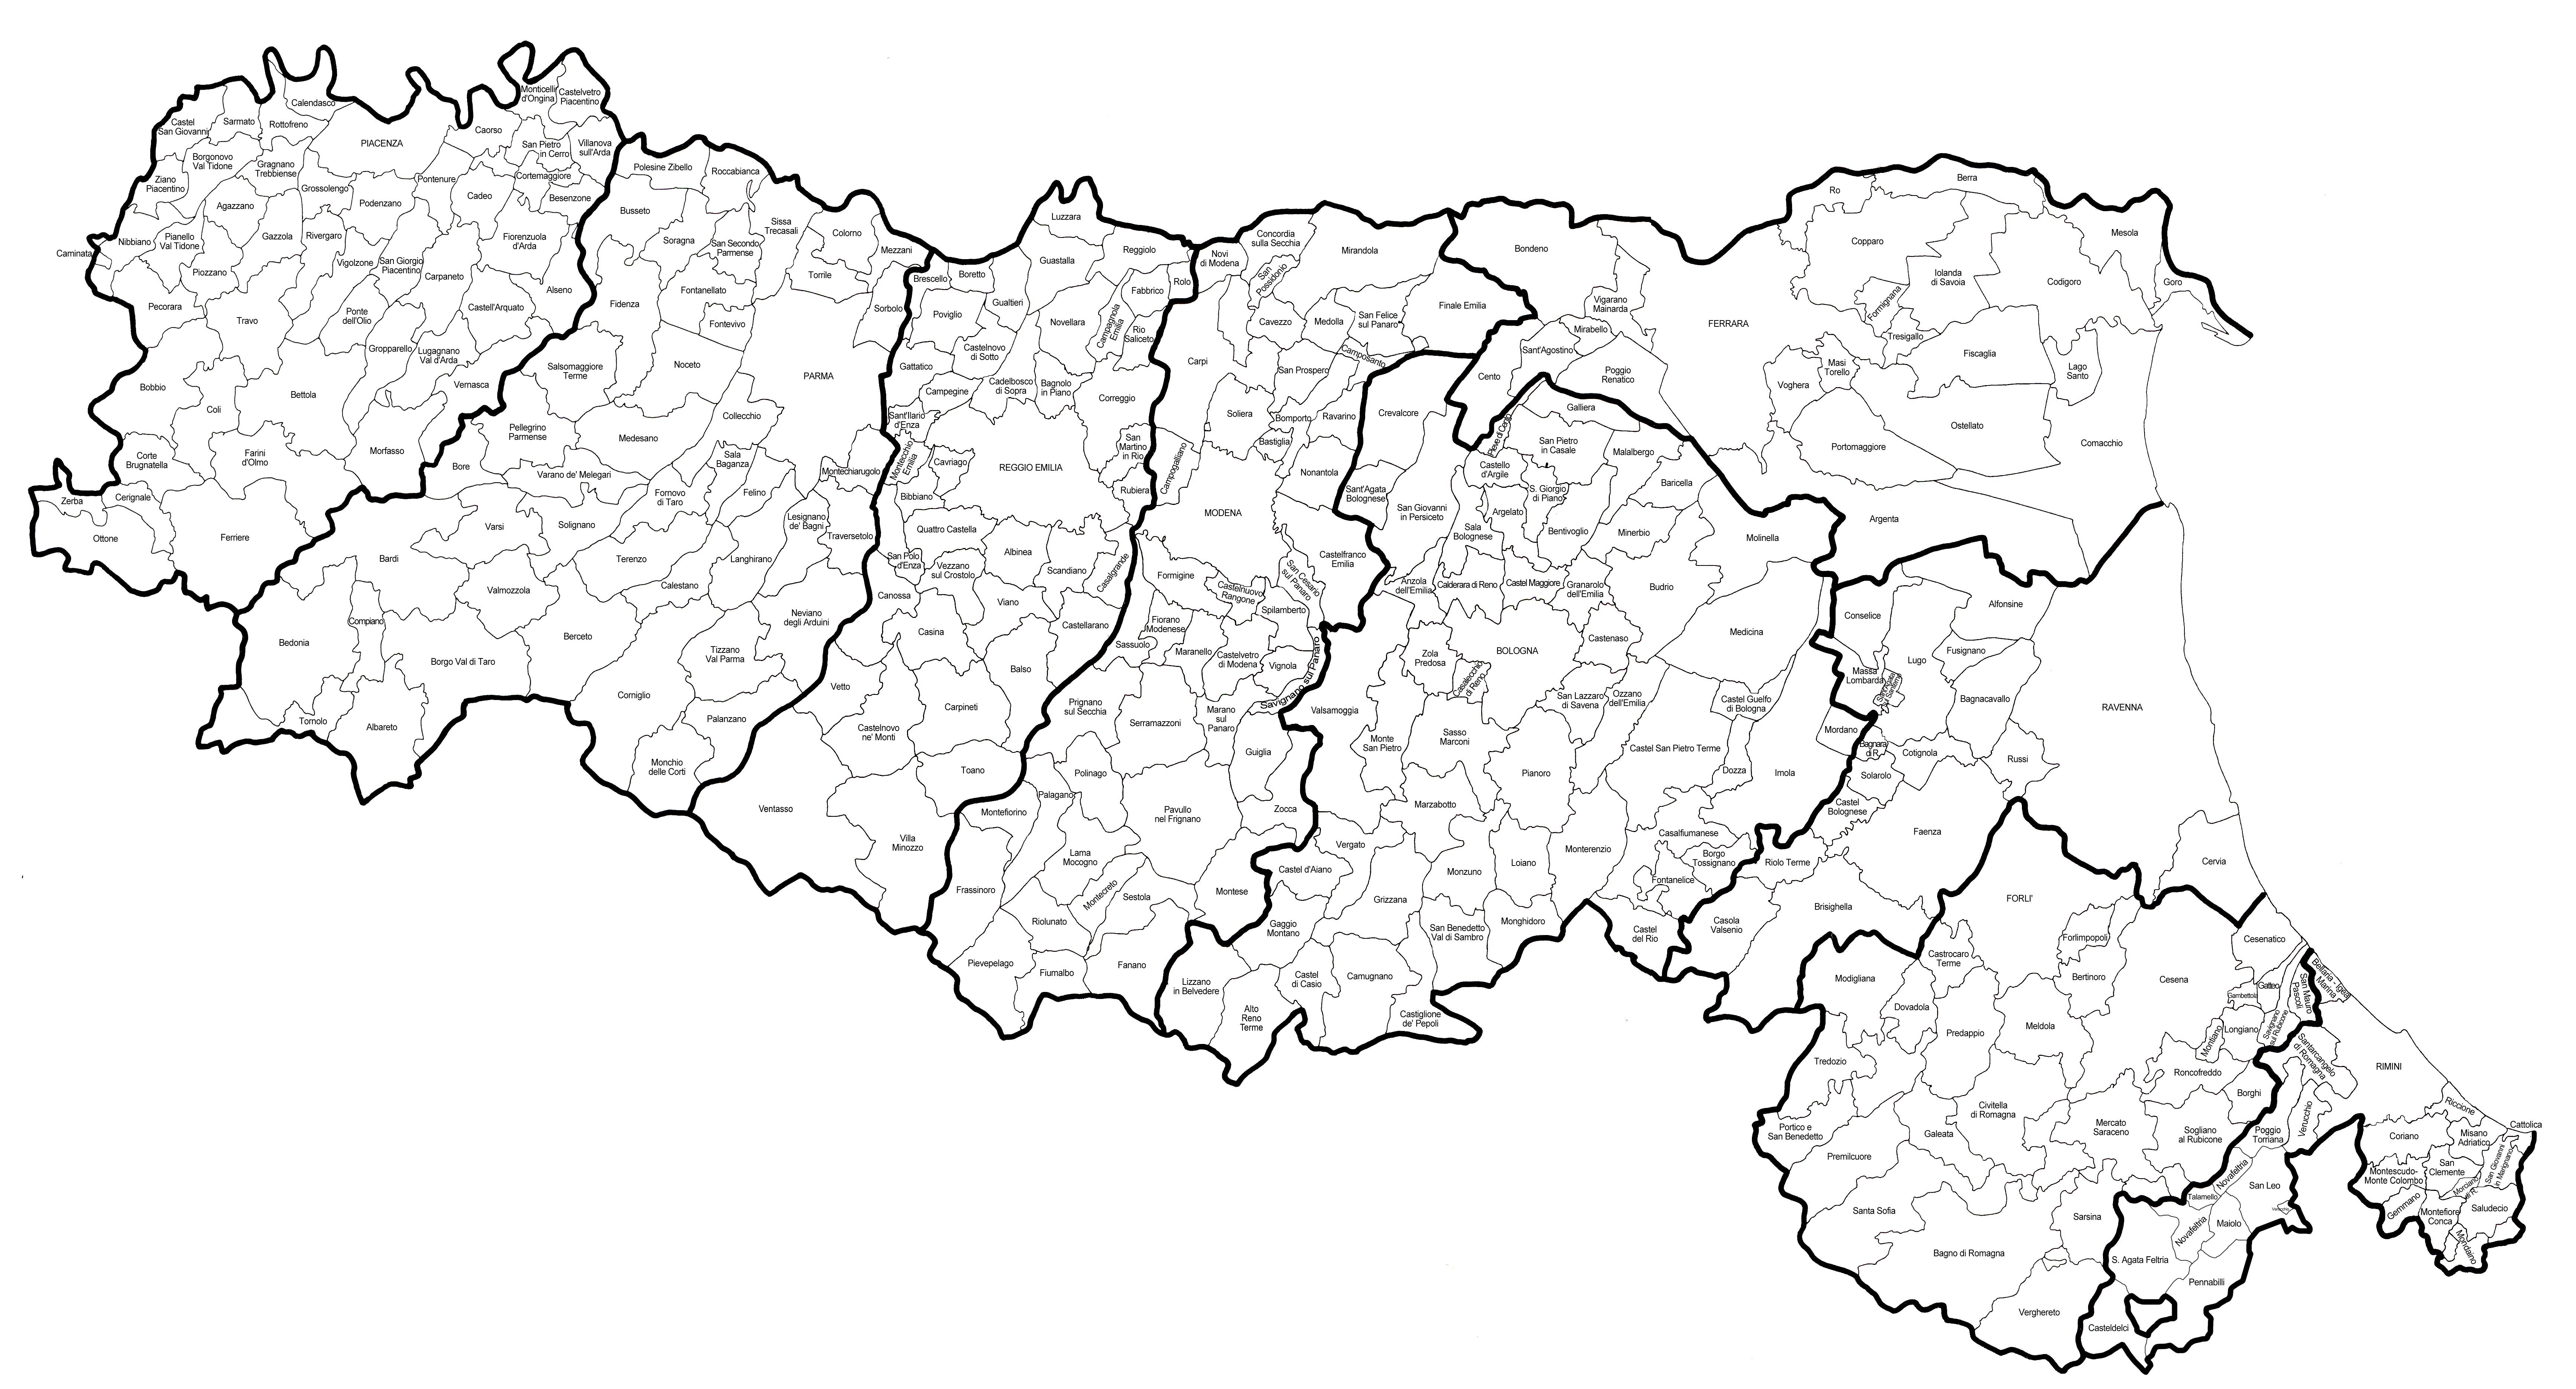 Cartina Comuni Emilia Romagna.File Mappa Regione Emilia Romagna Jpg Wikimedia Commons